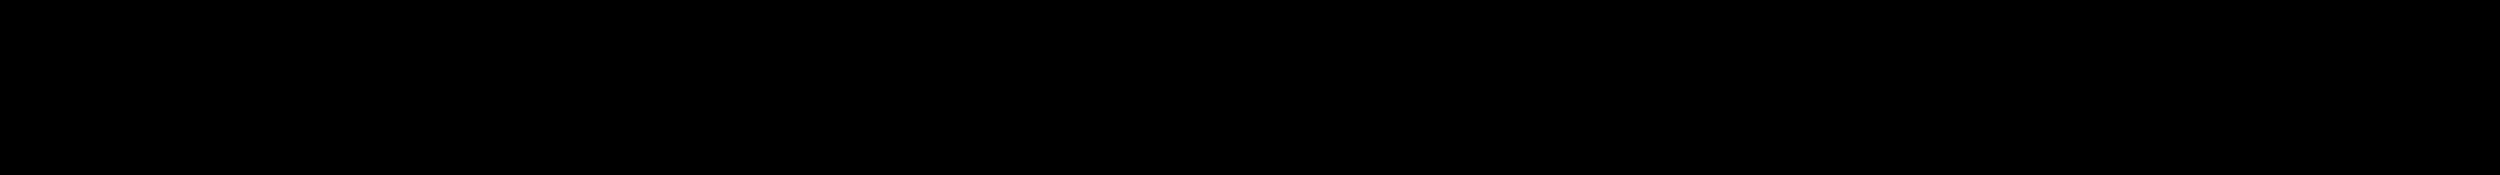 whowhatwear-logo.png